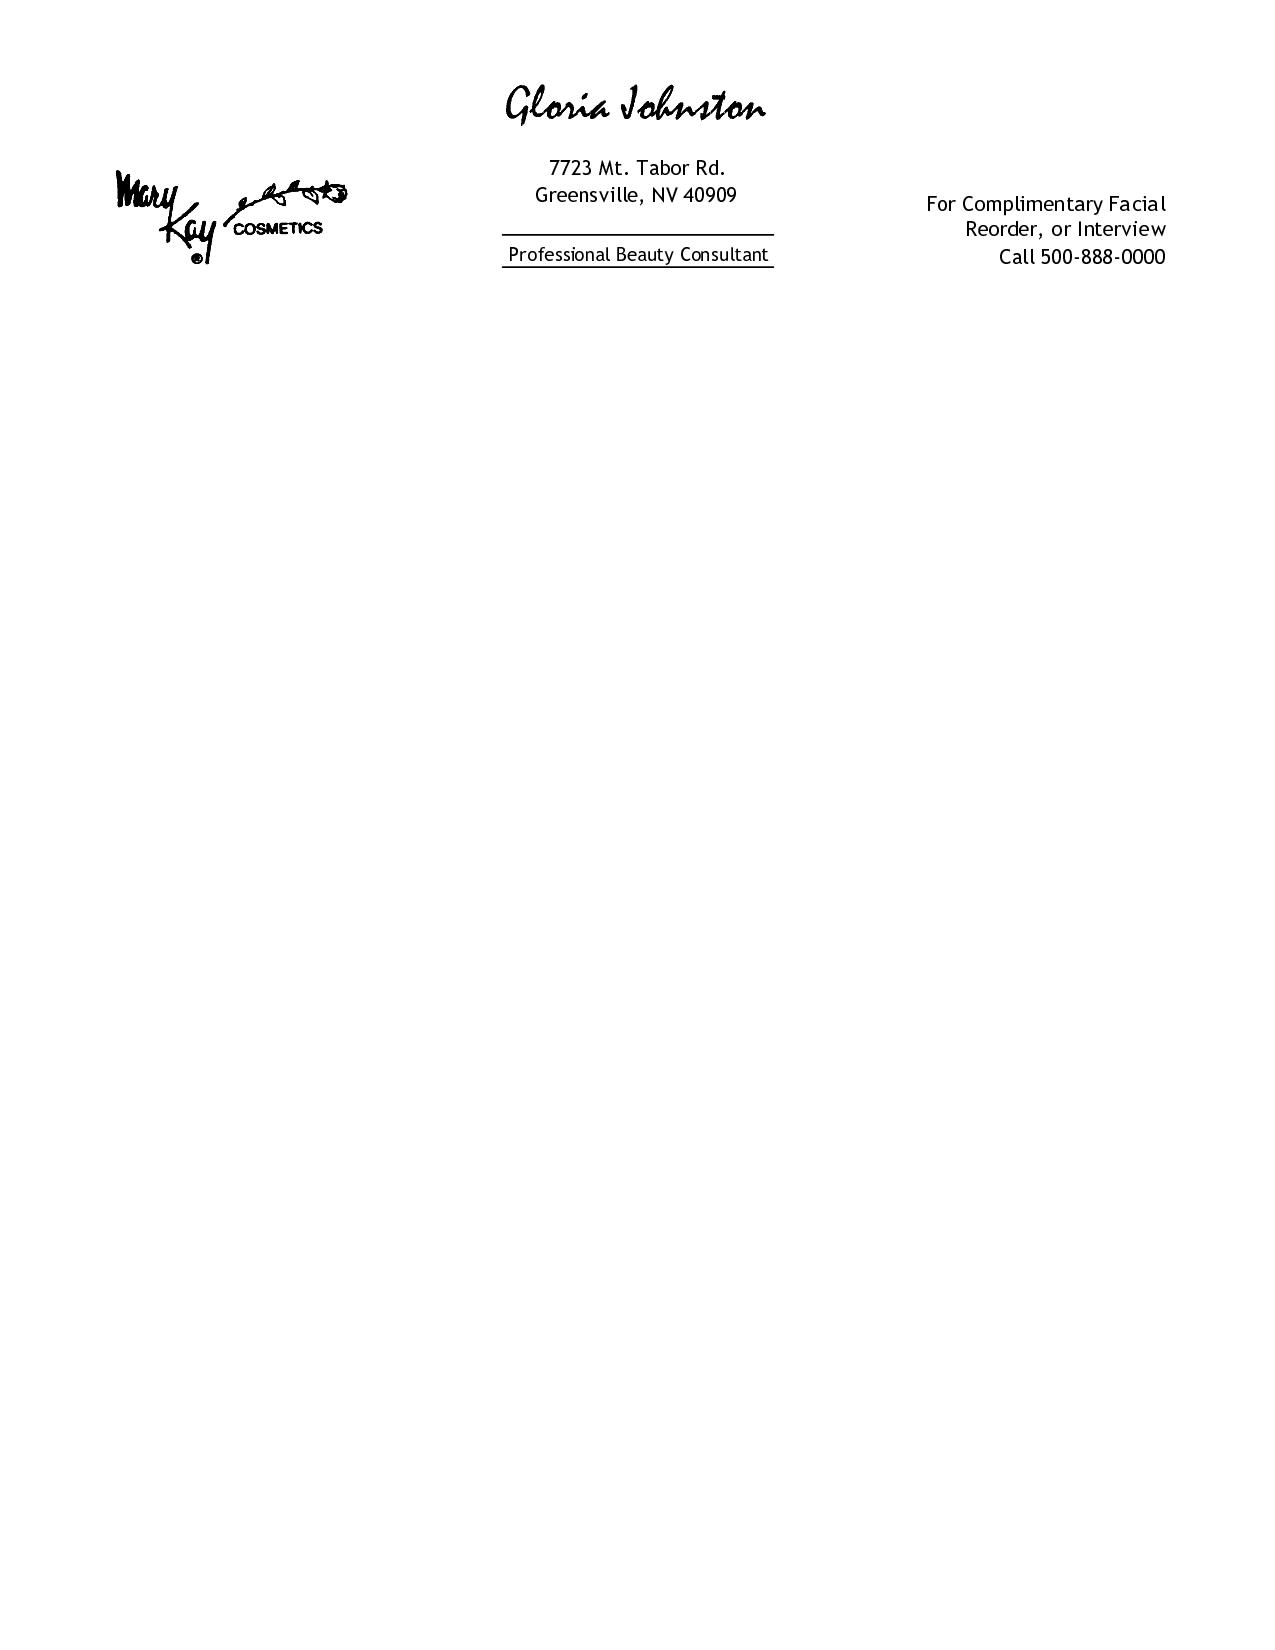 Free Printable Personal Letterhead Templates | Free Professional - Free Printable Letterhead Templates